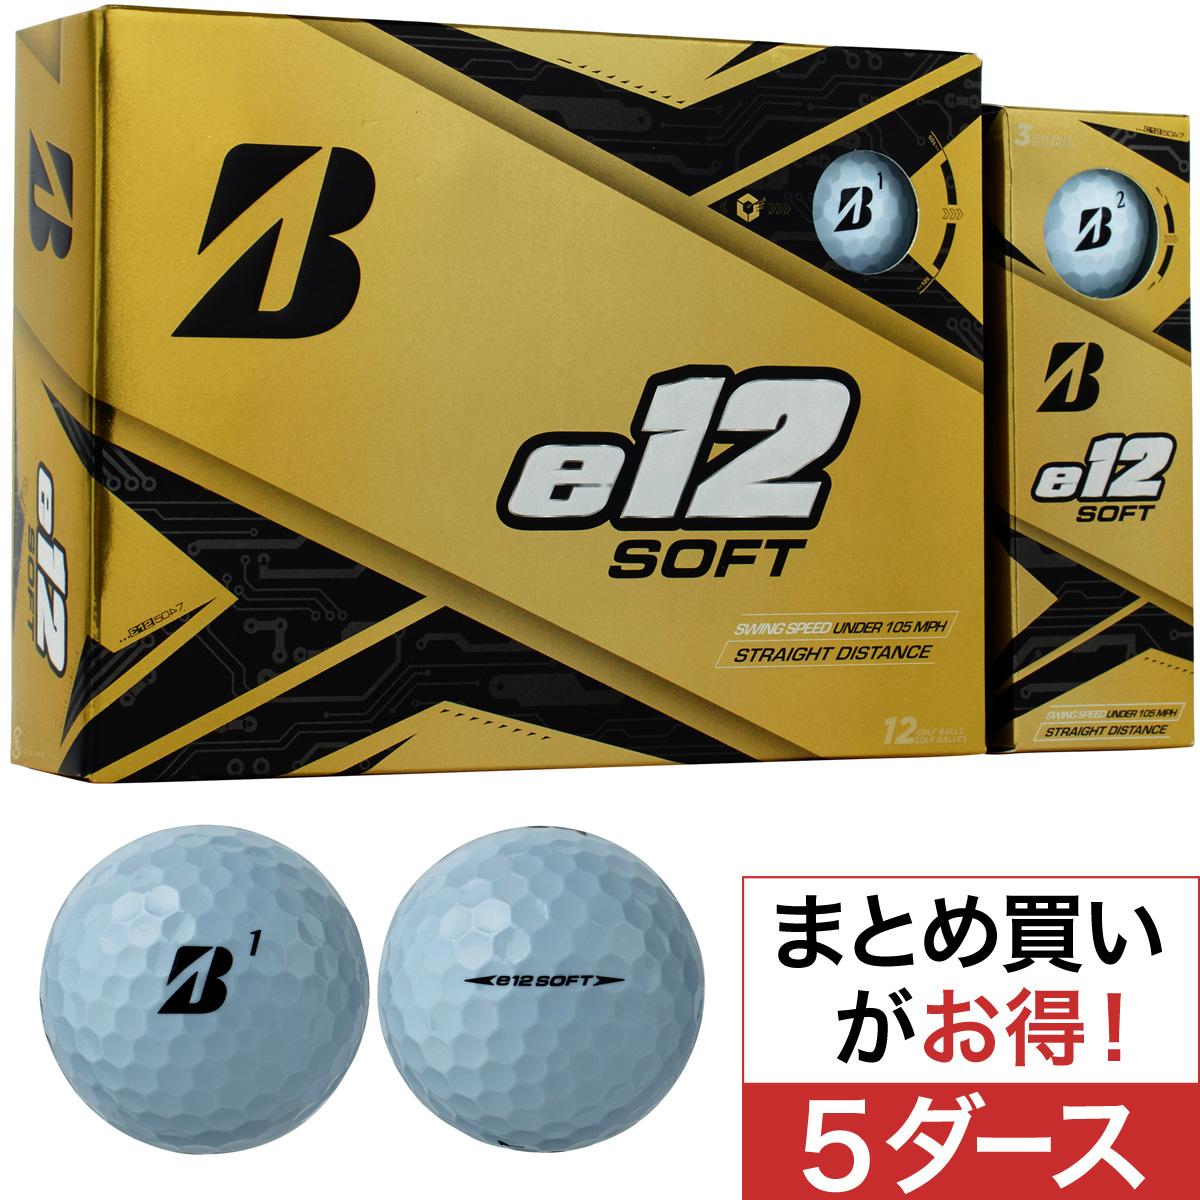 e12 SOFT ボール 5ダースセット